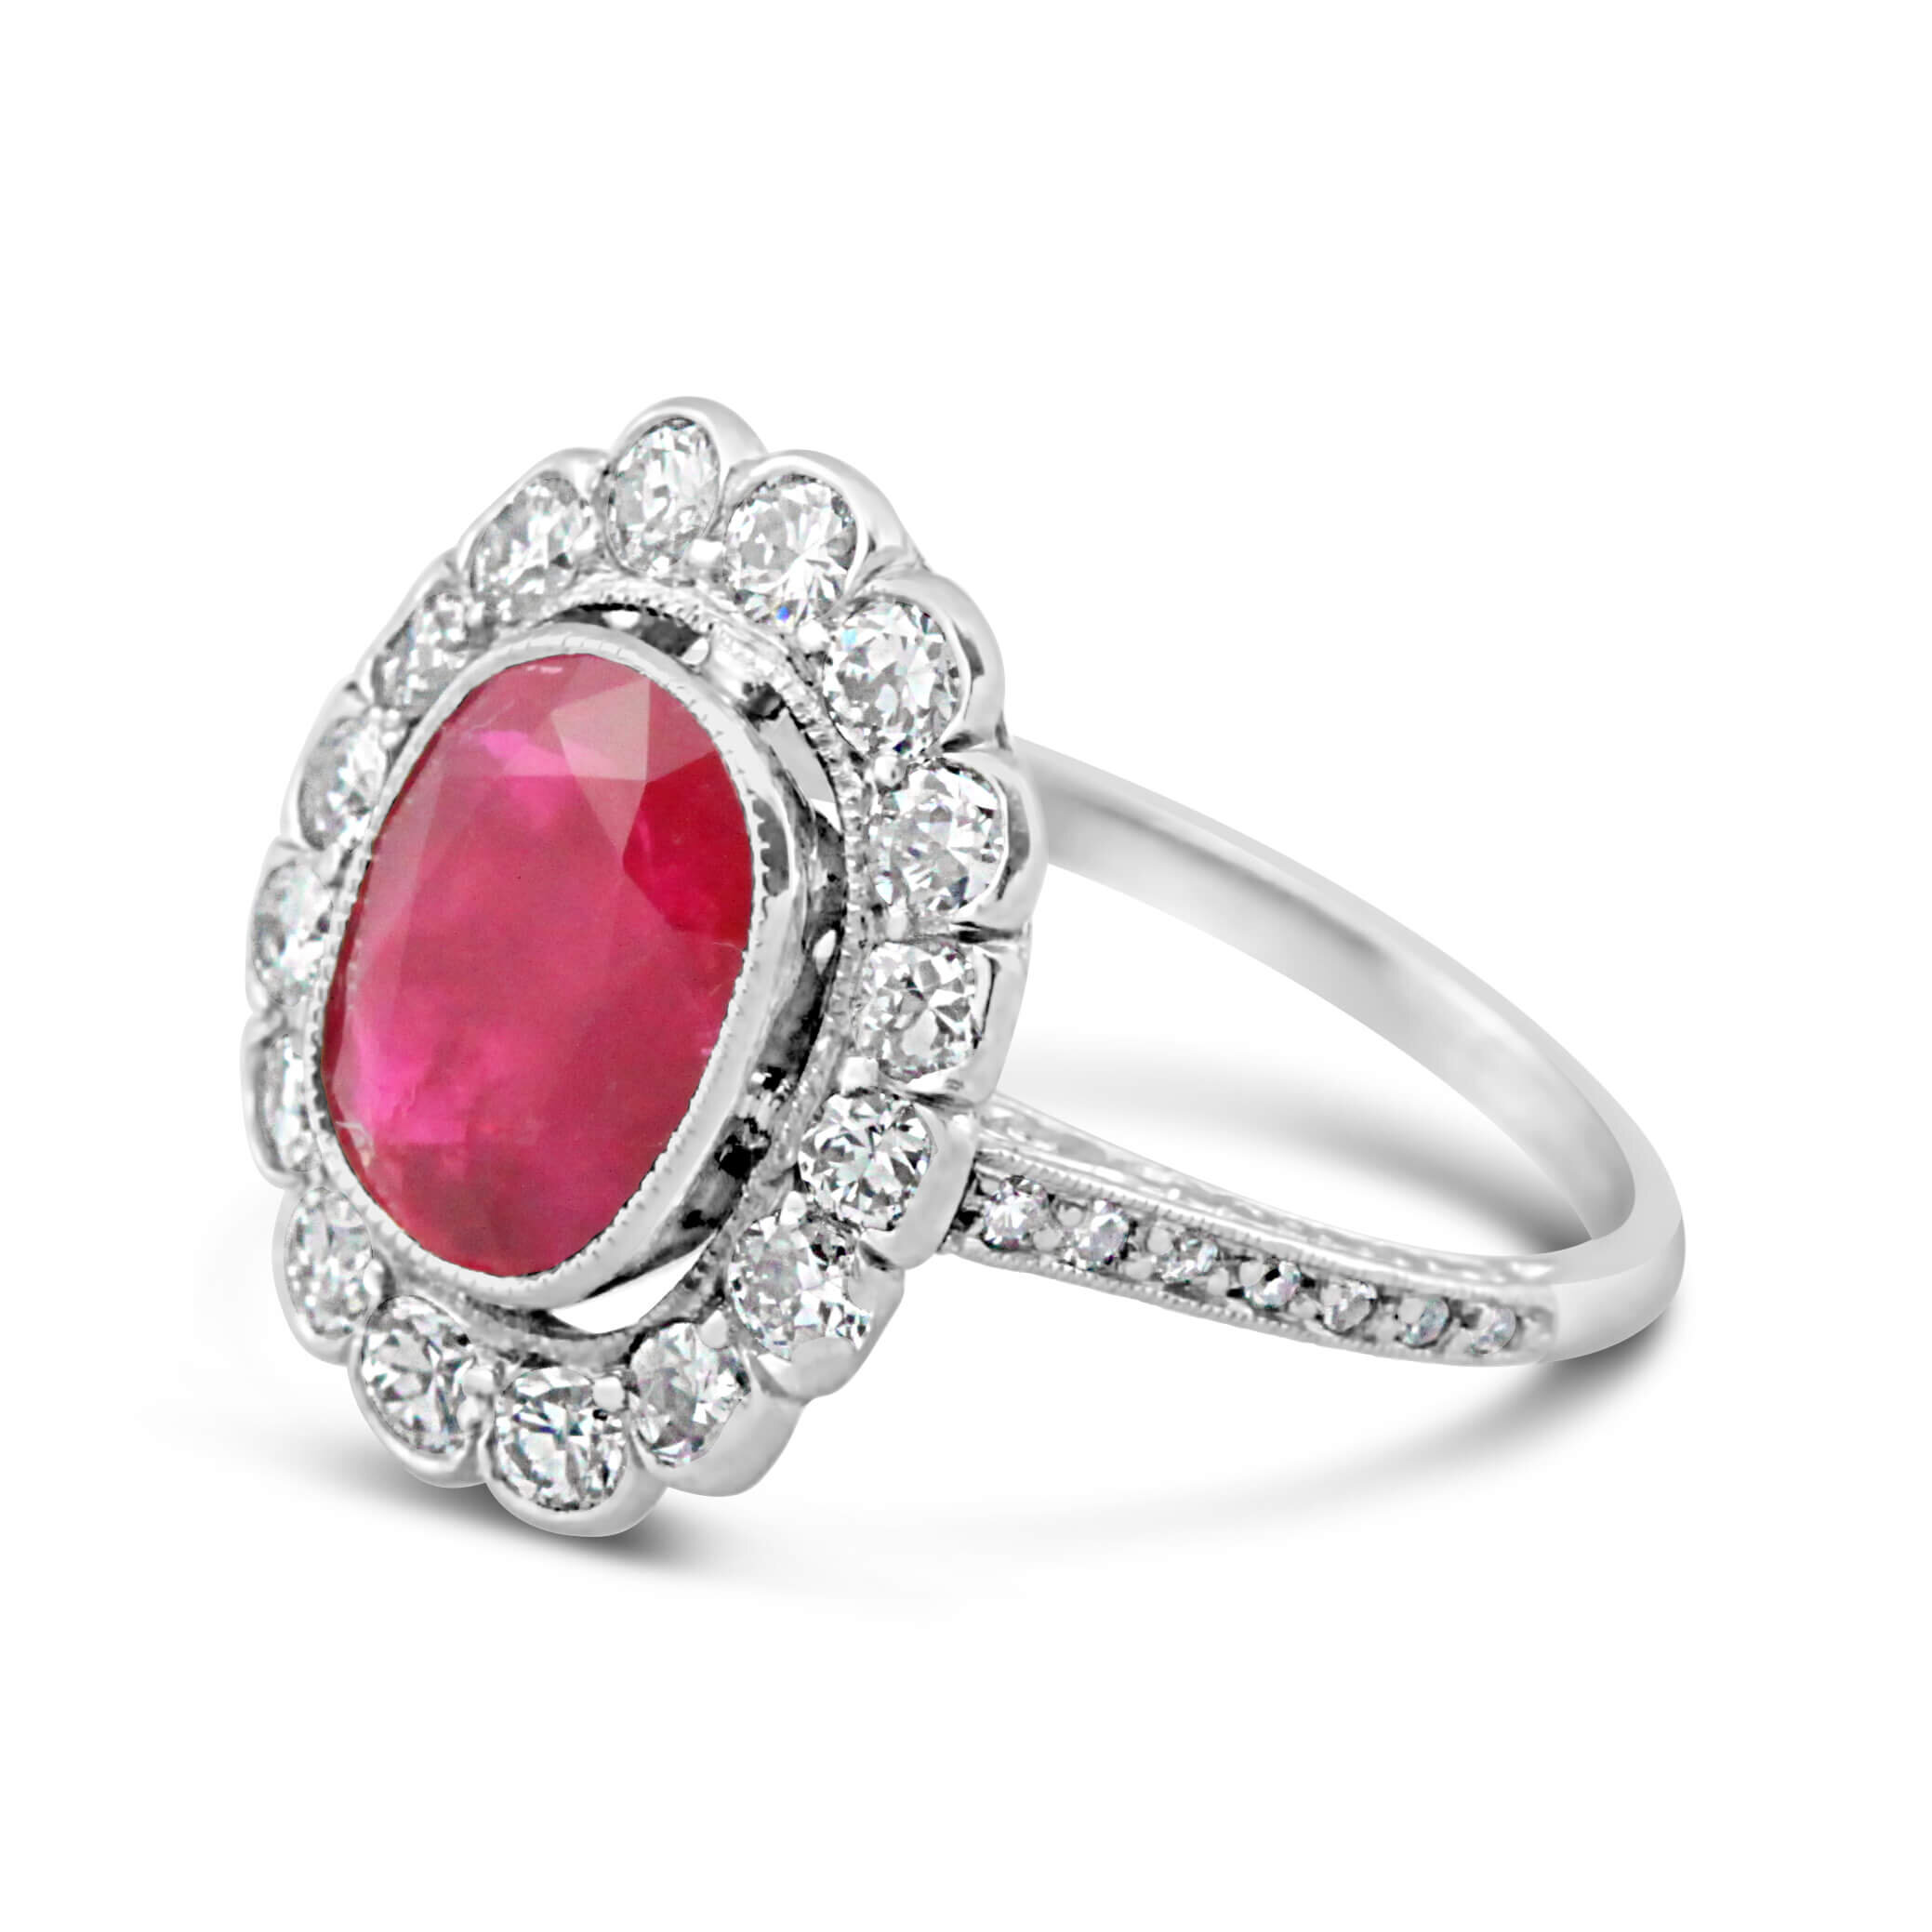 2 ct Unheated Burma Ruby Platinum Ring_side.jpg